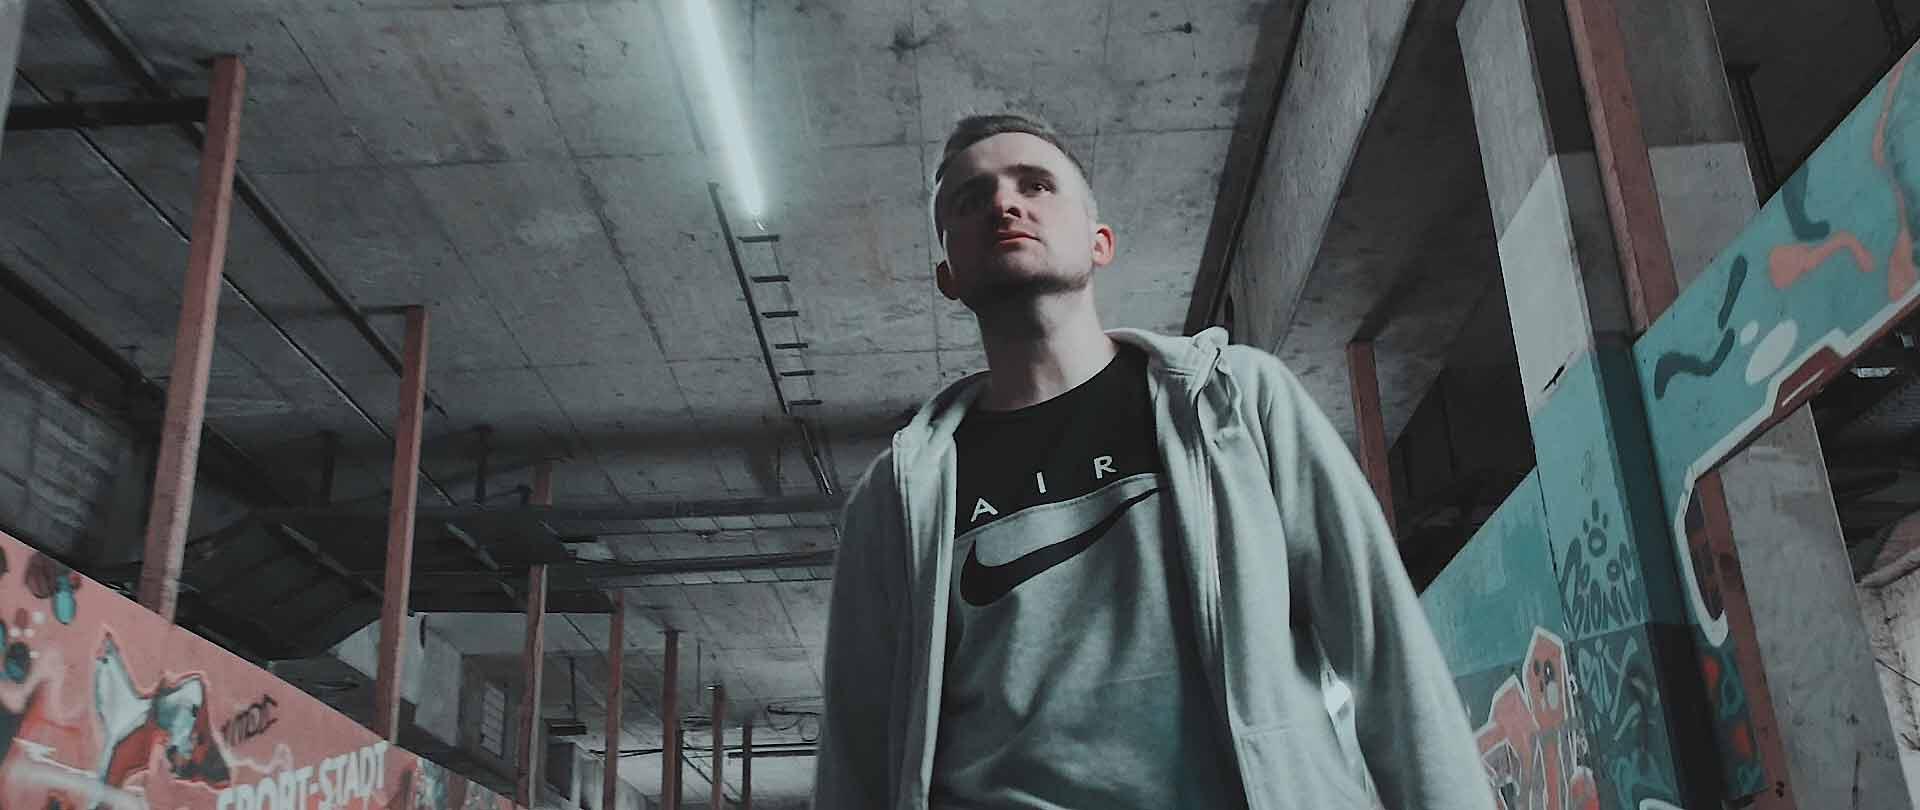 Blazin'Daniel---Miguel-Pablo-Overkill-(Official-Video)-(31)